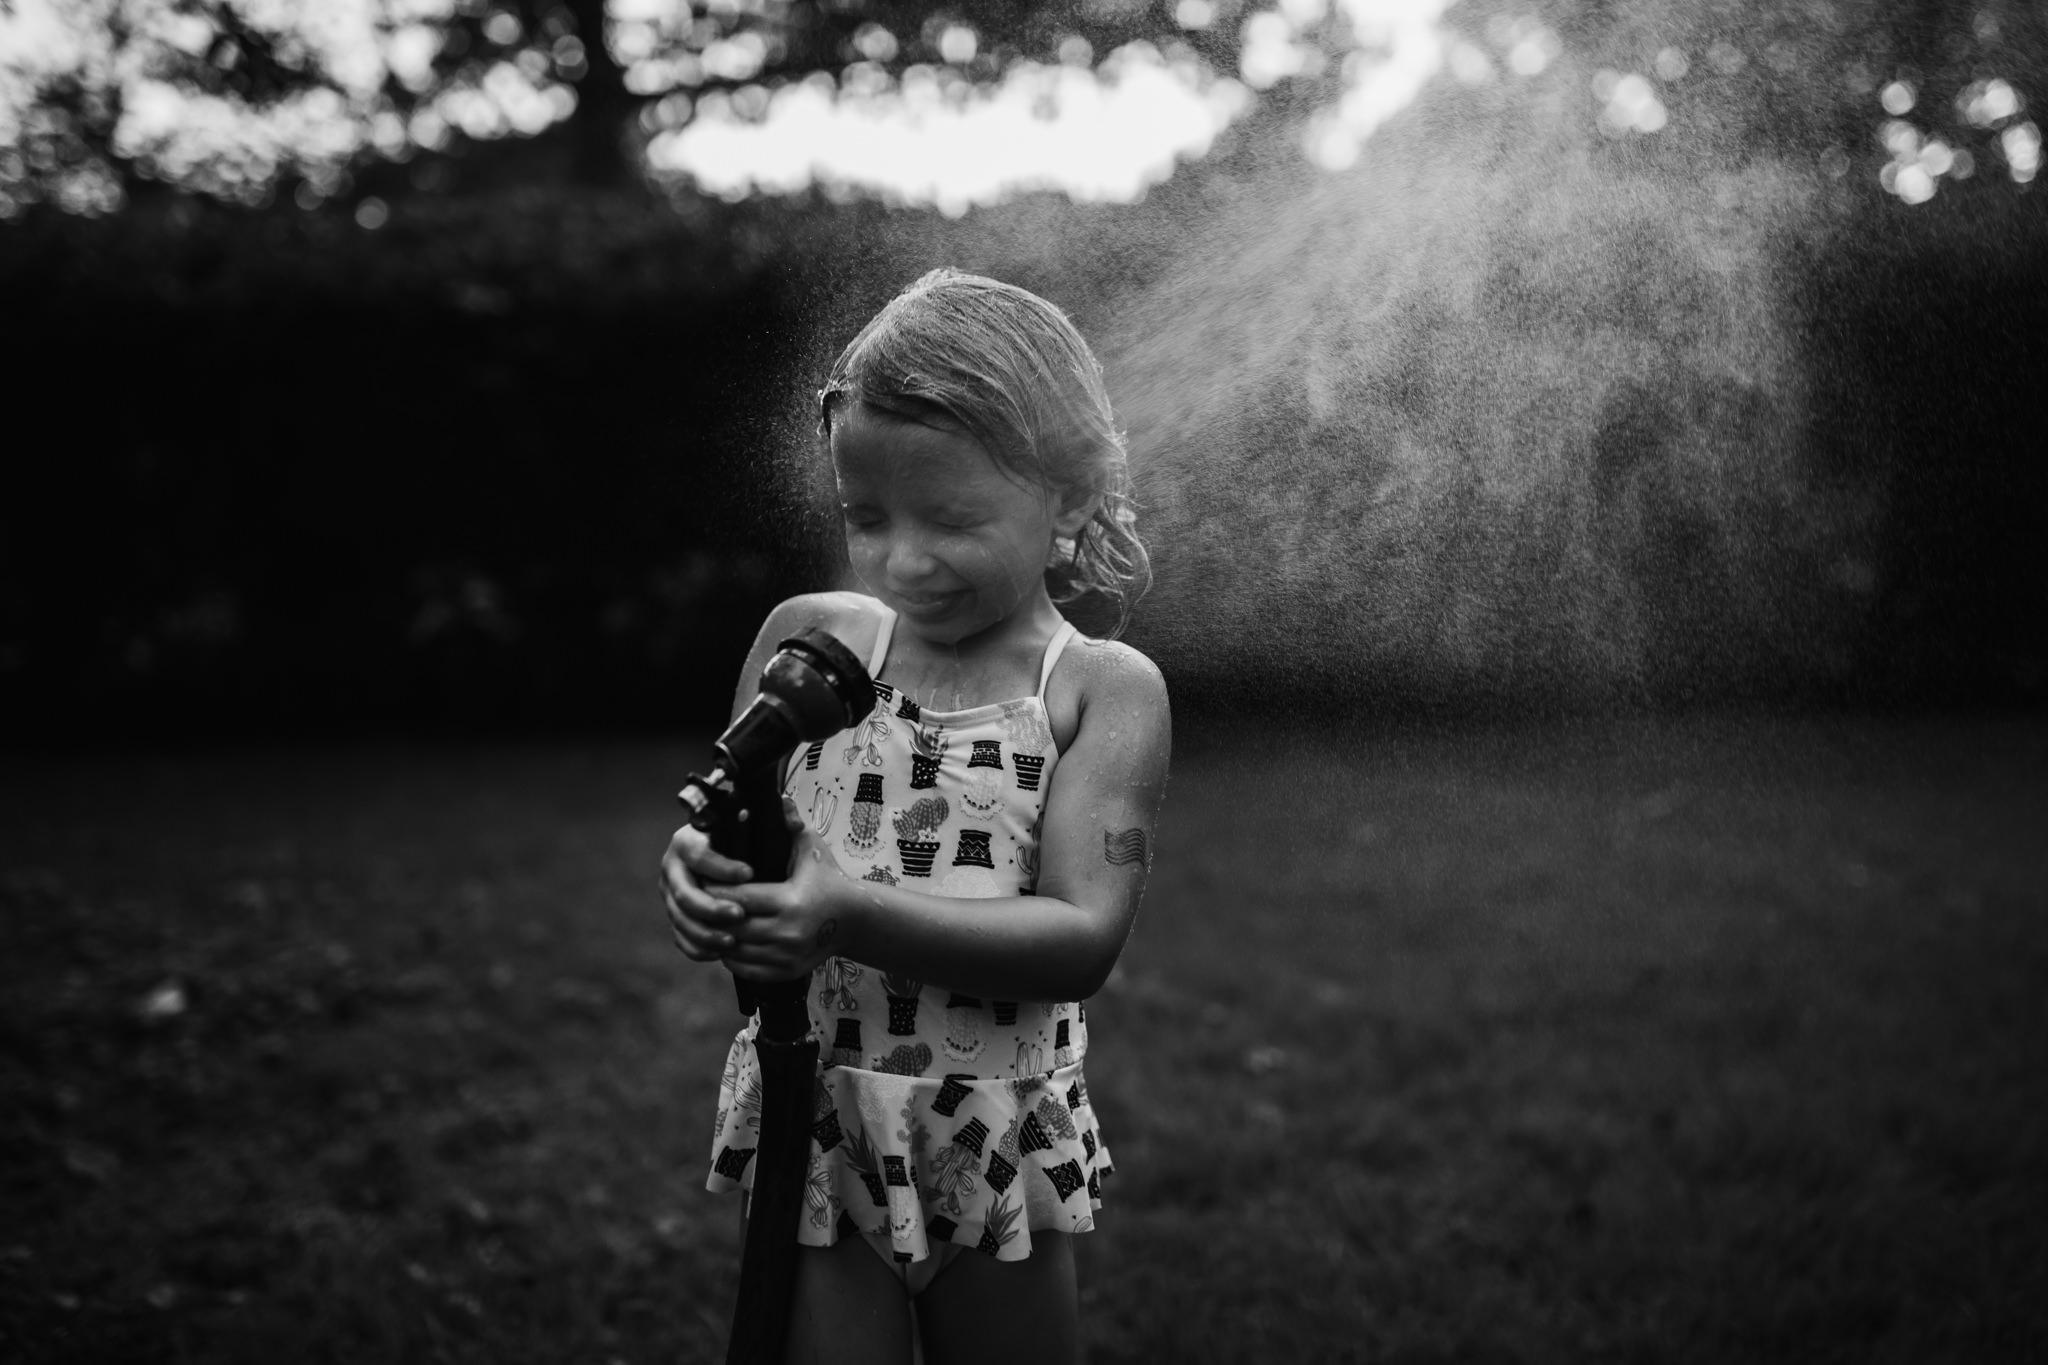 cassie-cook-photography-memphis-lifestyle-family-photographer-46.jpg